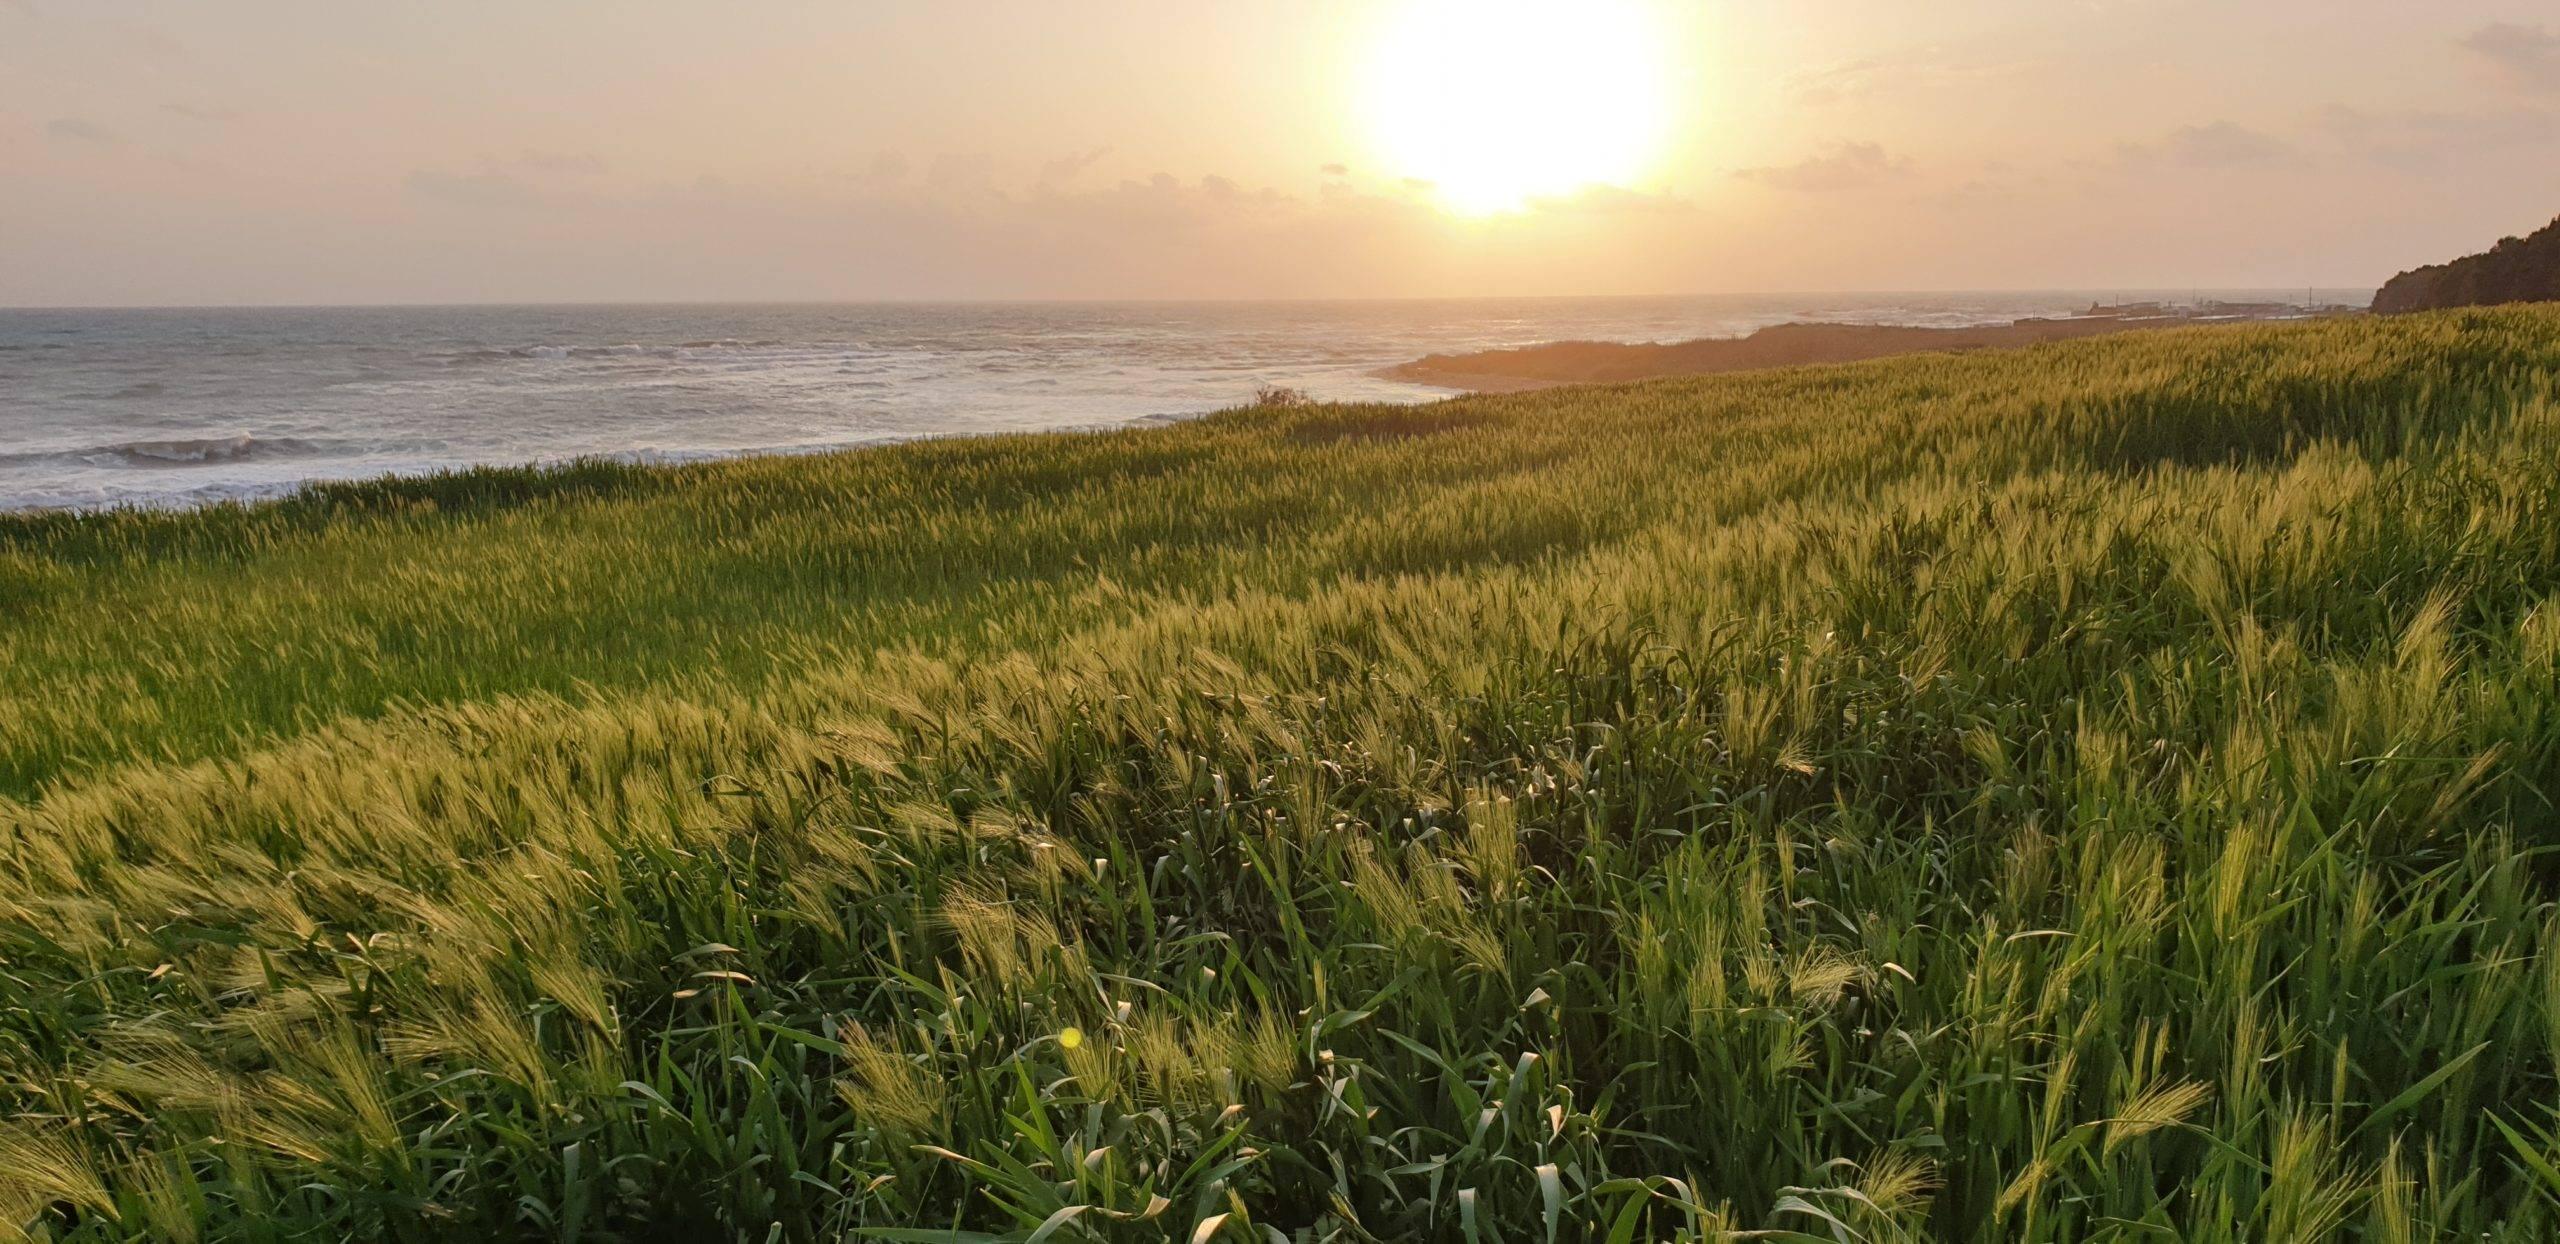 Zypern in Februar - so sieht die Insel aus